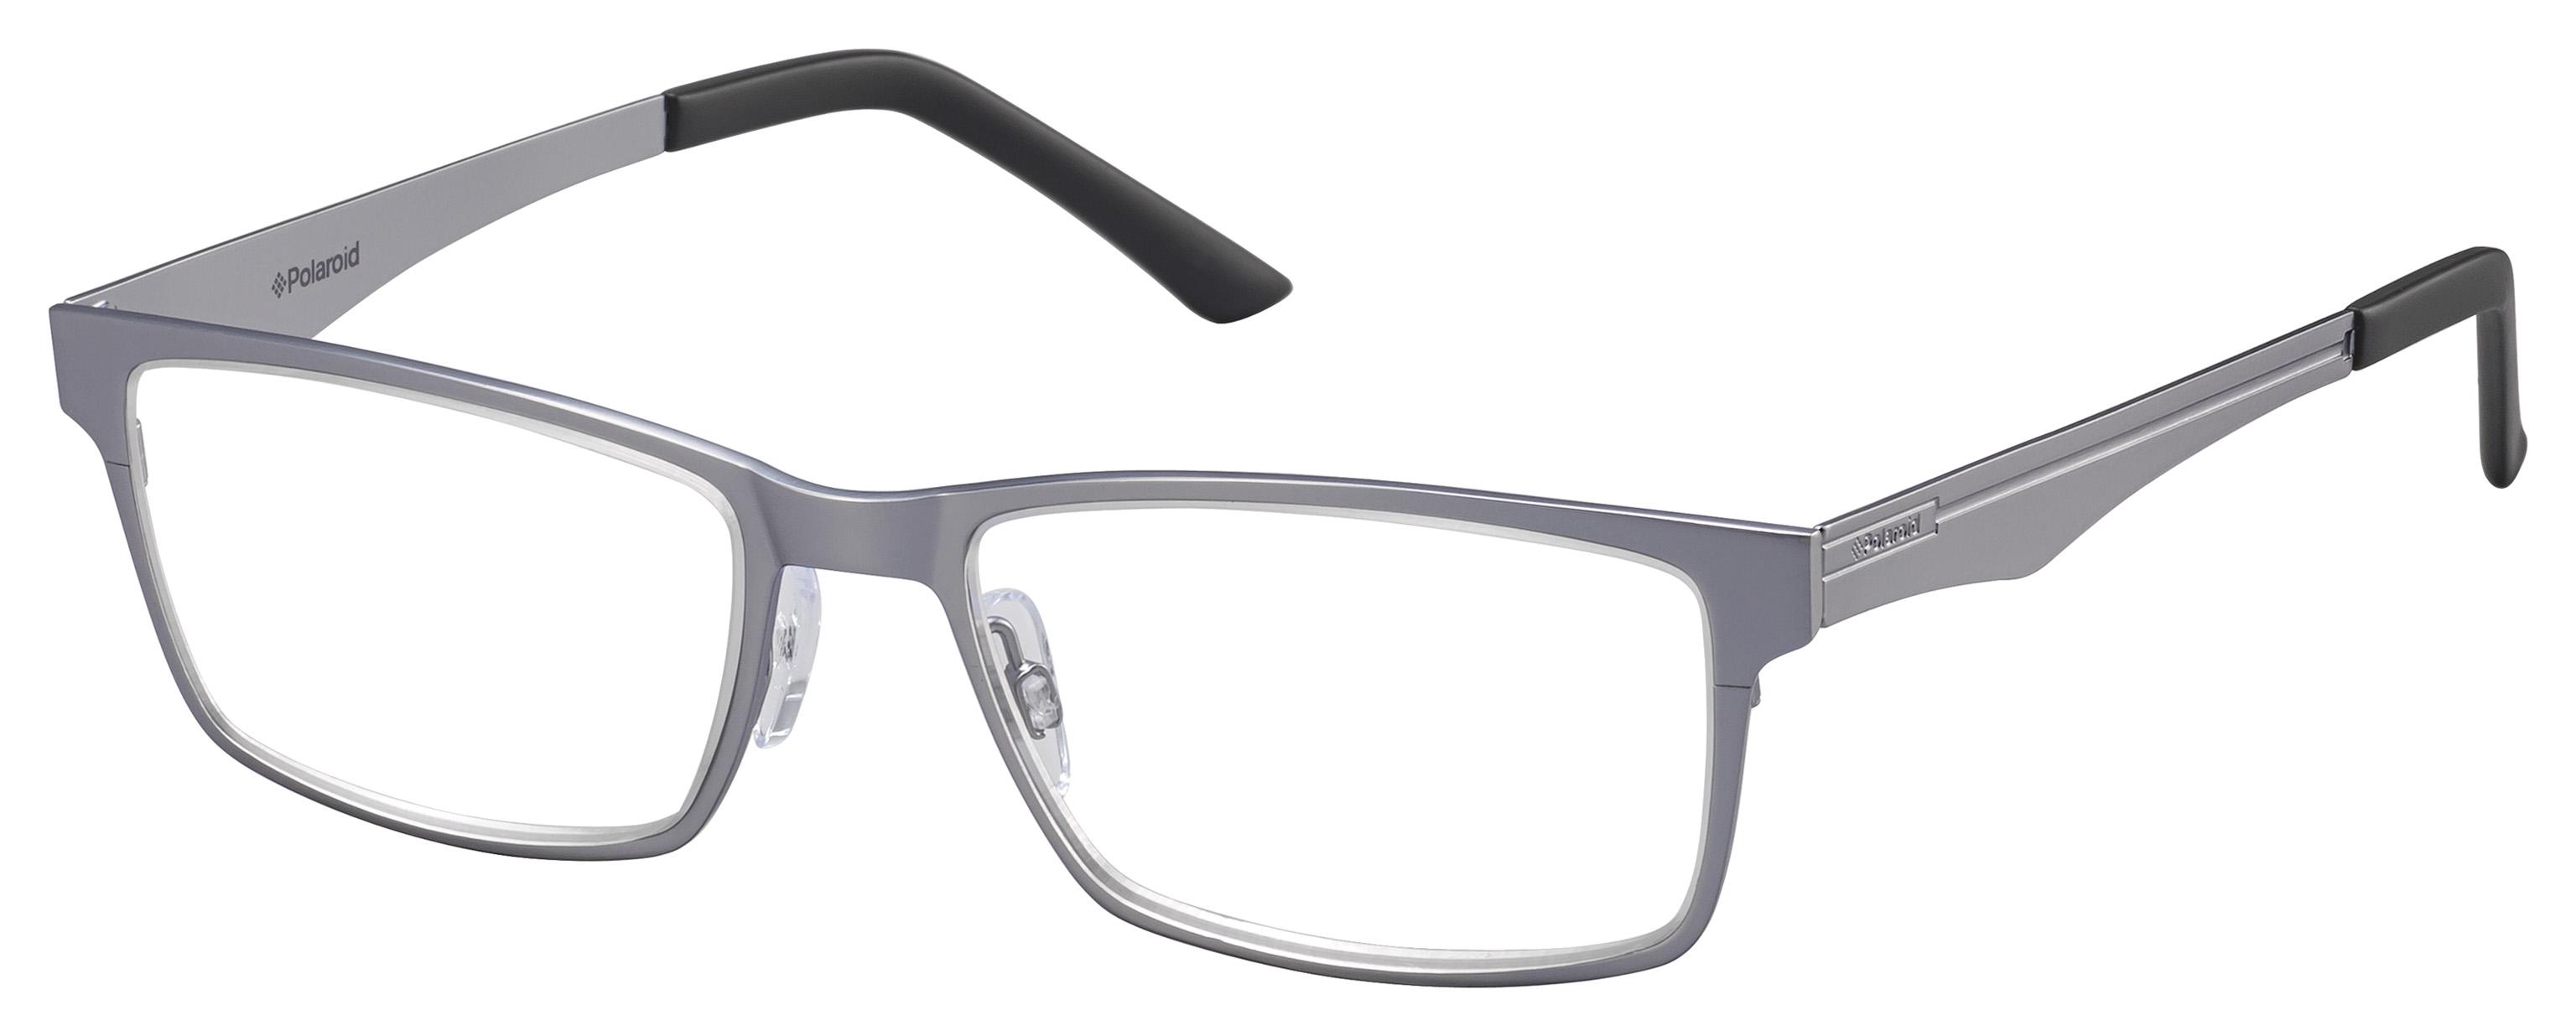 Leesbril Polaroid PLD0003 zilver